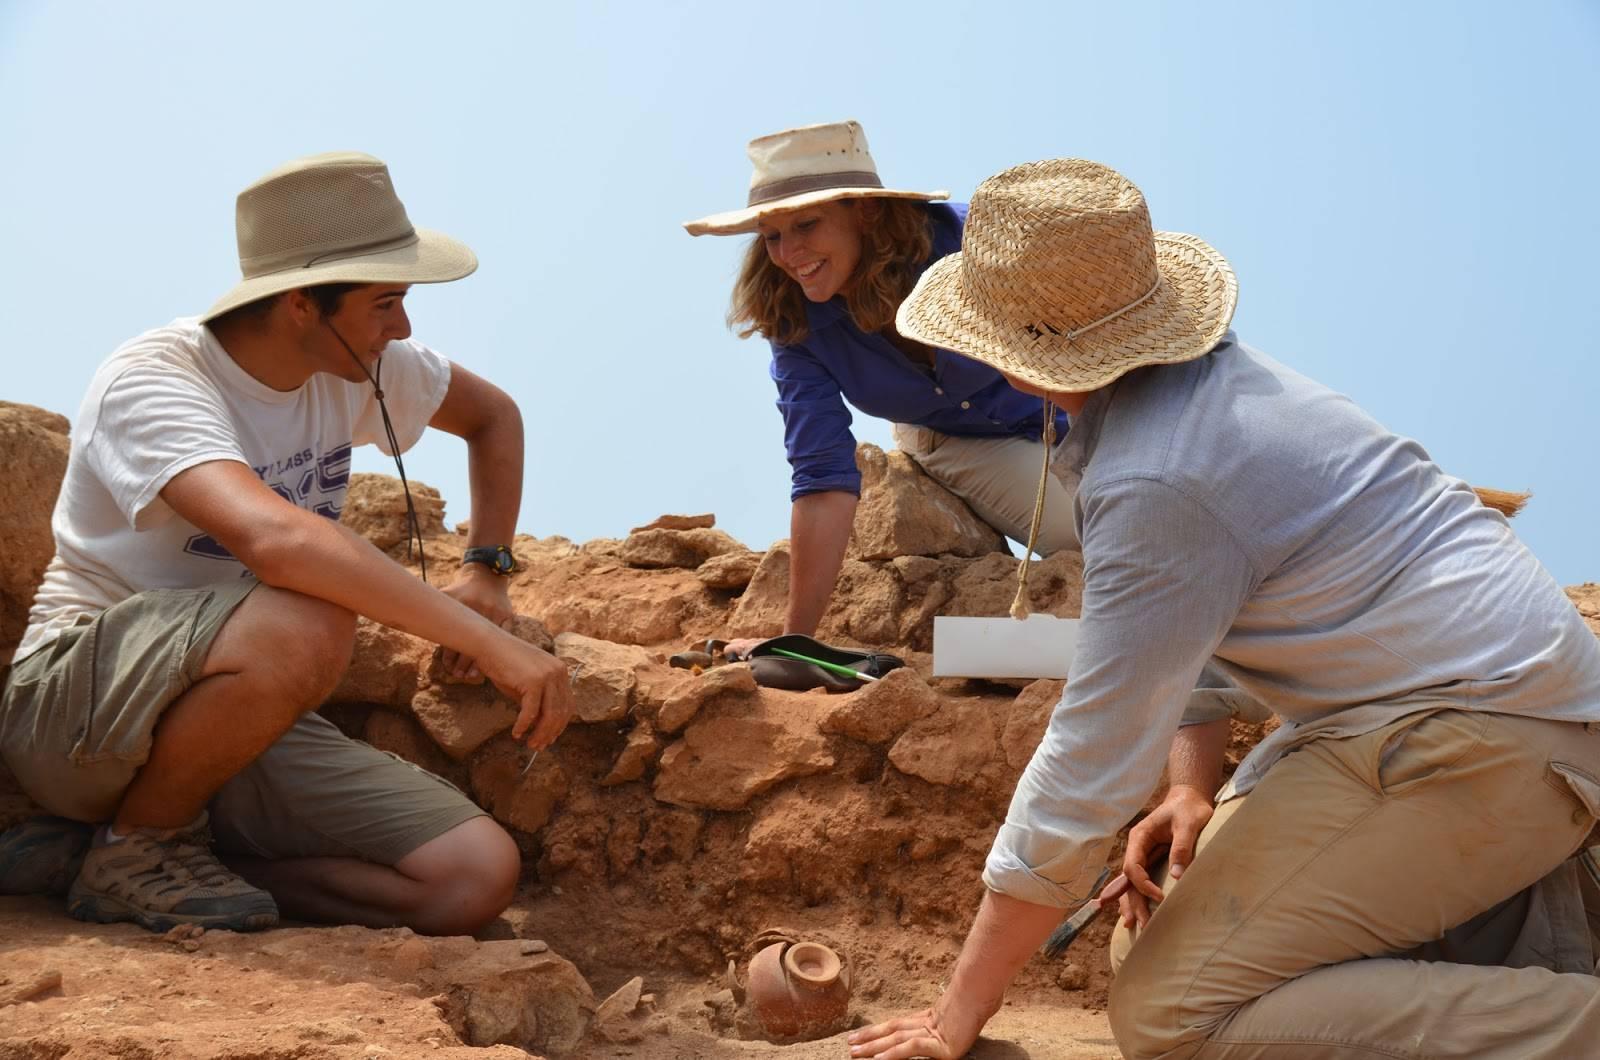 Археология как хобби и увлечение